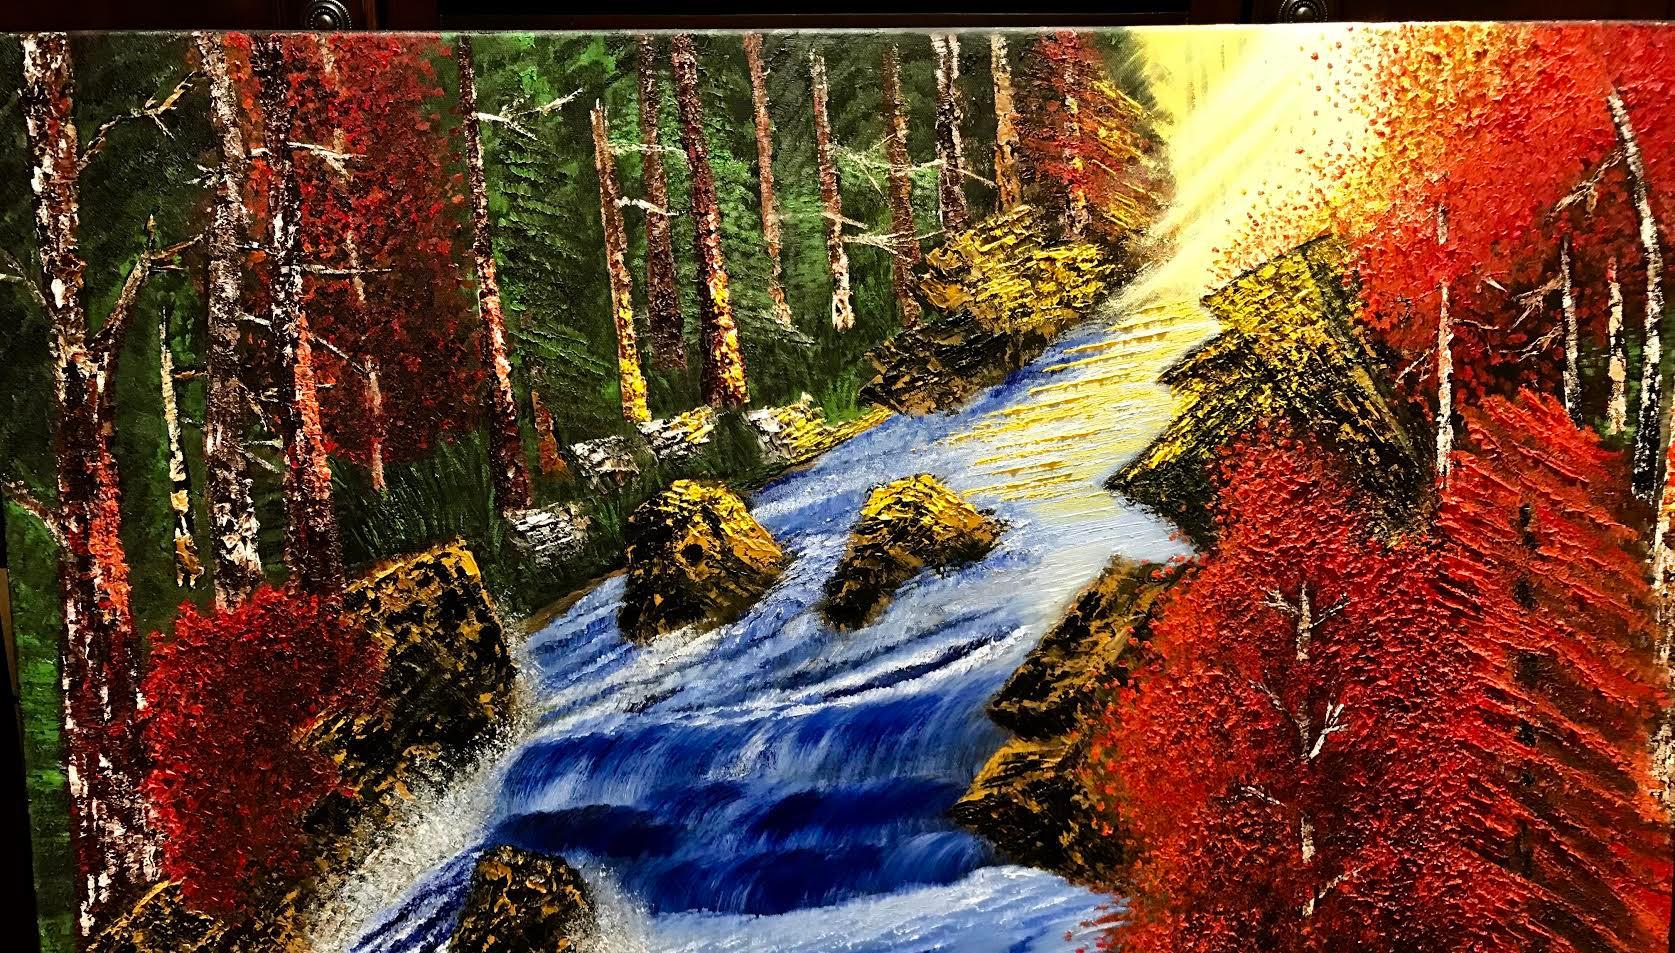 Whitfield Creek